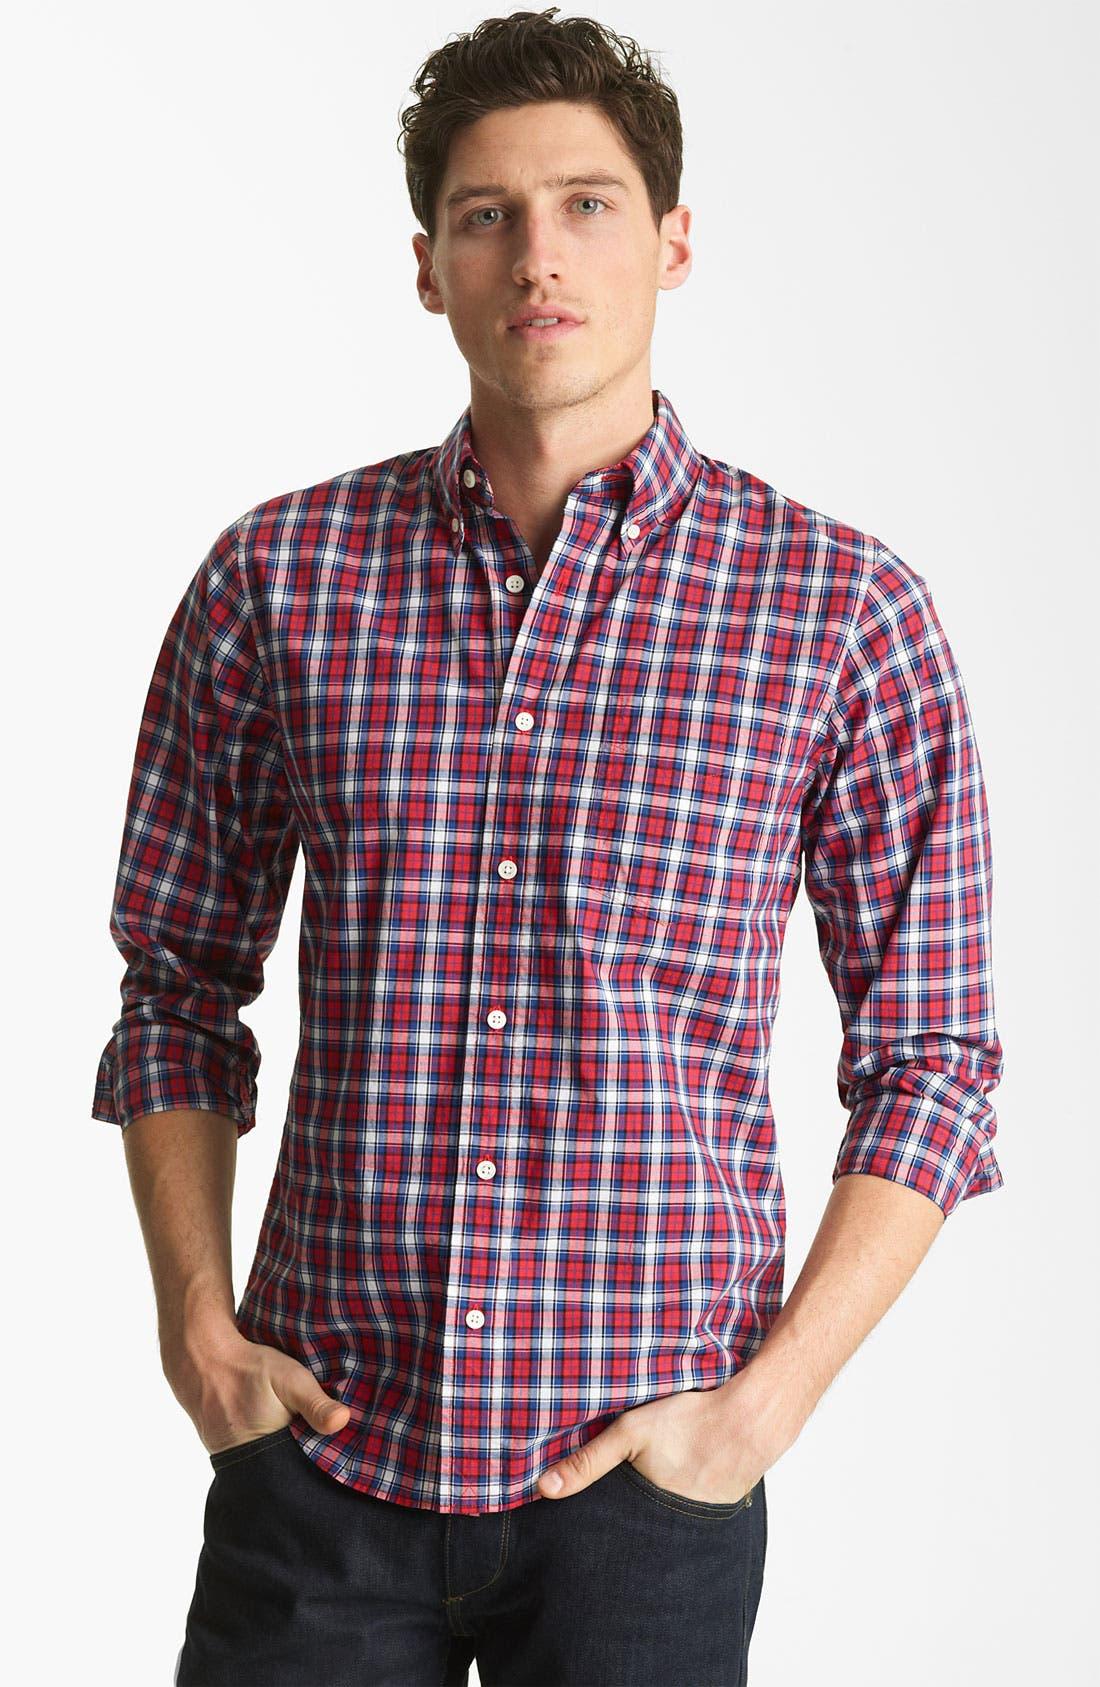 Main Image - Jack Spade 'Philips' Plaid Woven Shirt